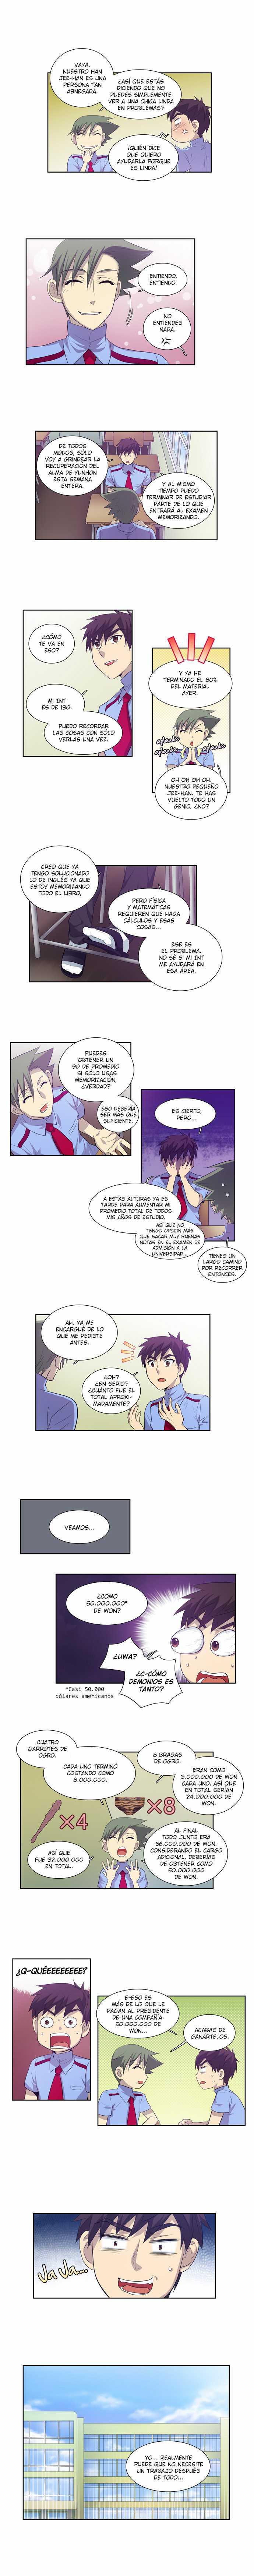 http://c5.ninemanga.com/es_manga/61/1725/364515/361e598b16a6d657f3db845b23a5d3da.jpg Page 6